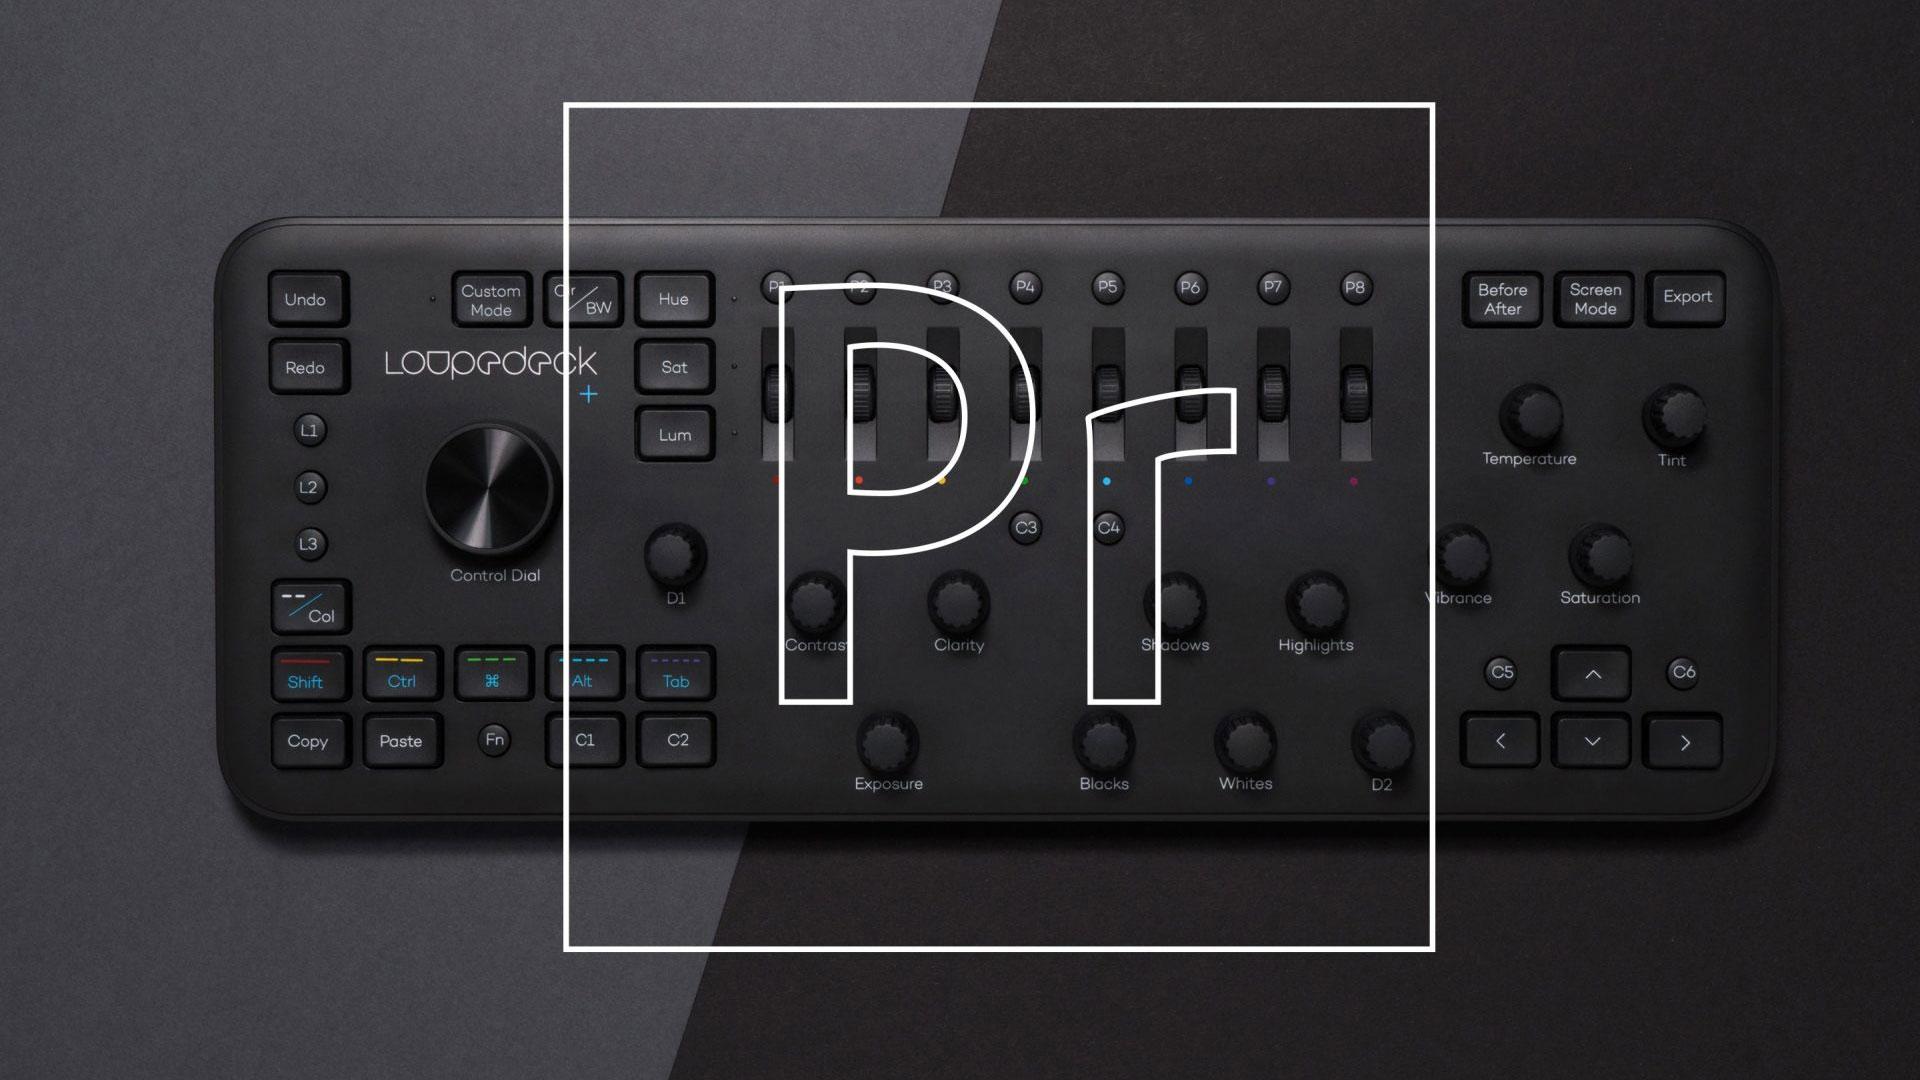 LoupedeckがLoupedeck+ Adobe Premiere Pro CC用コントロールインターフェースをリリース